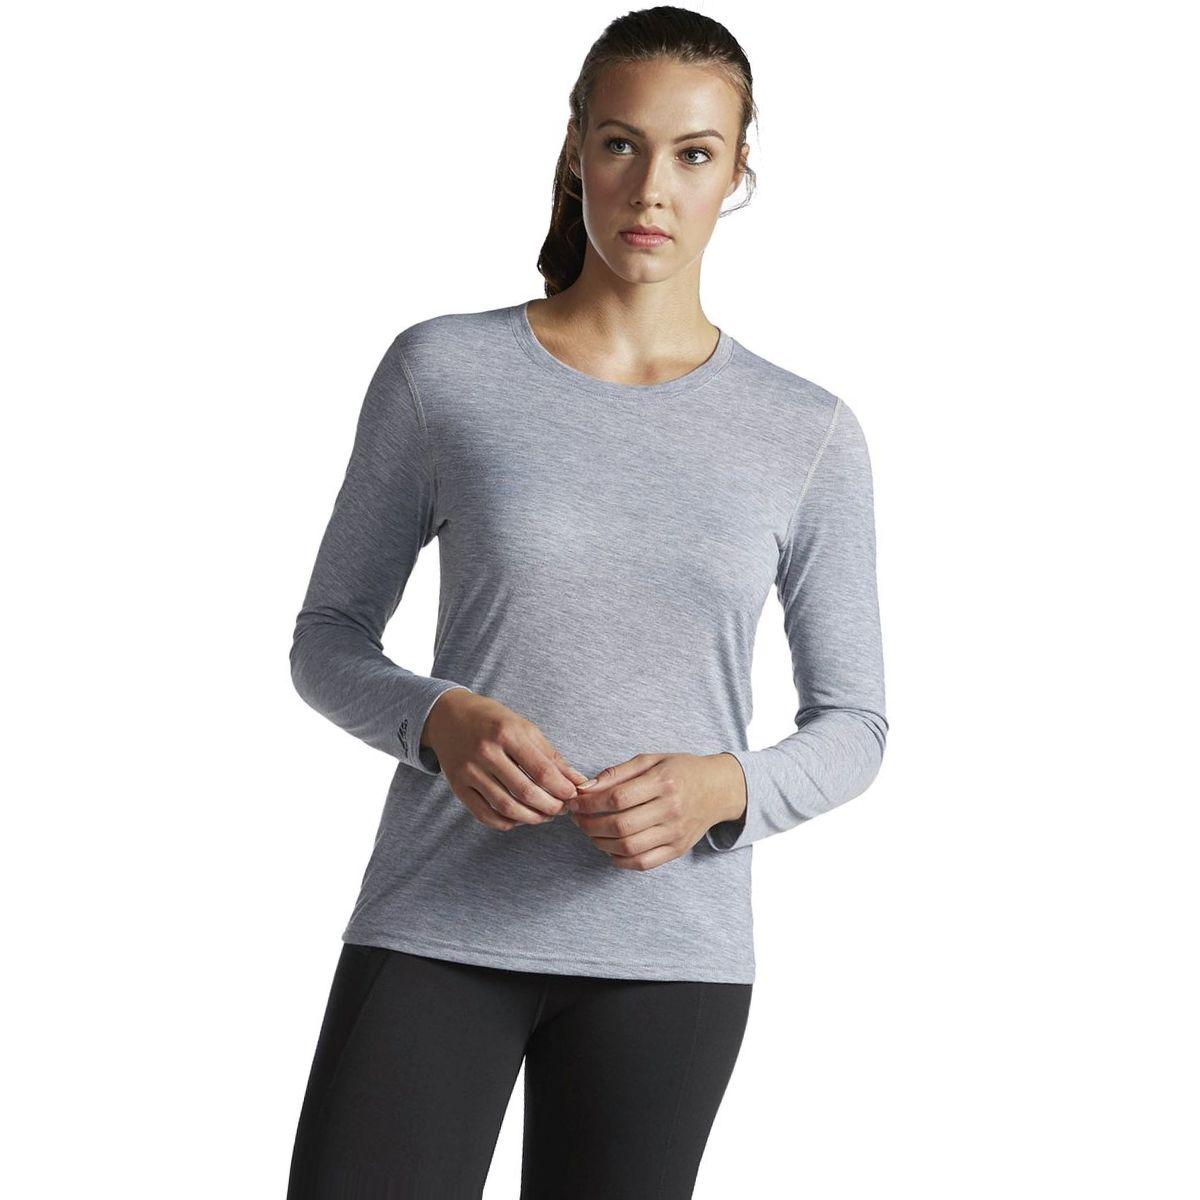 Adidas Outdoor Ultimate Long Sleeve T-Shirt - Women's